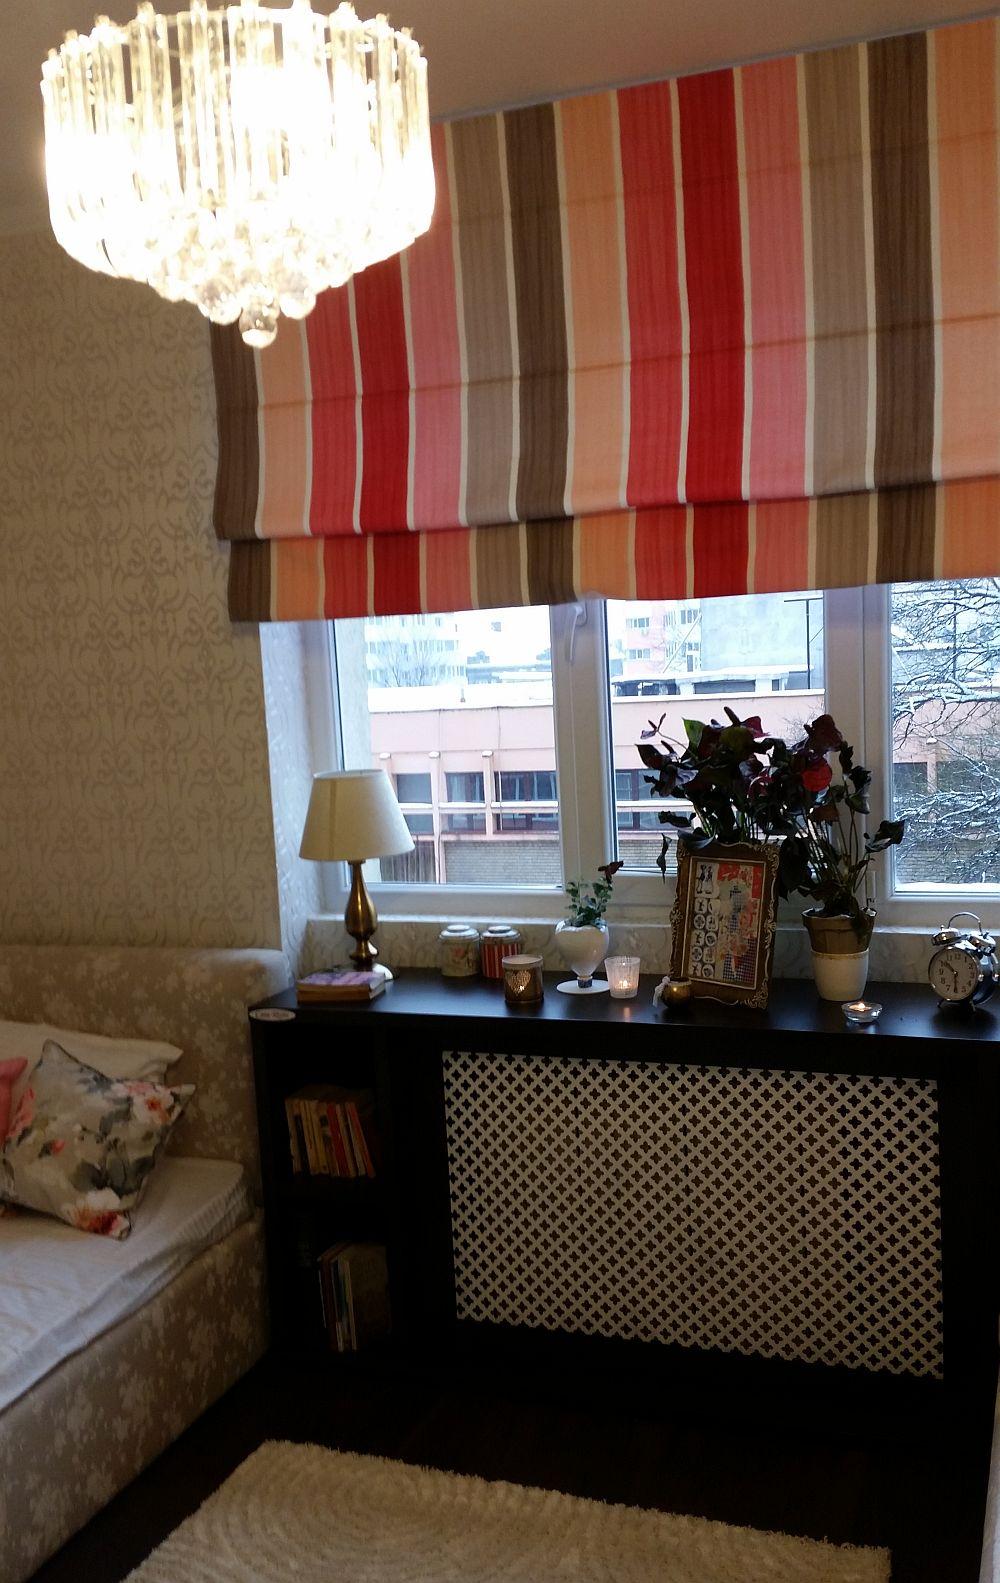 adelaparvu.com despre amenajare apartament Alice Muller din emisiunea Visuri la cheie de la ProTV, sezonul I, 2014 (7)